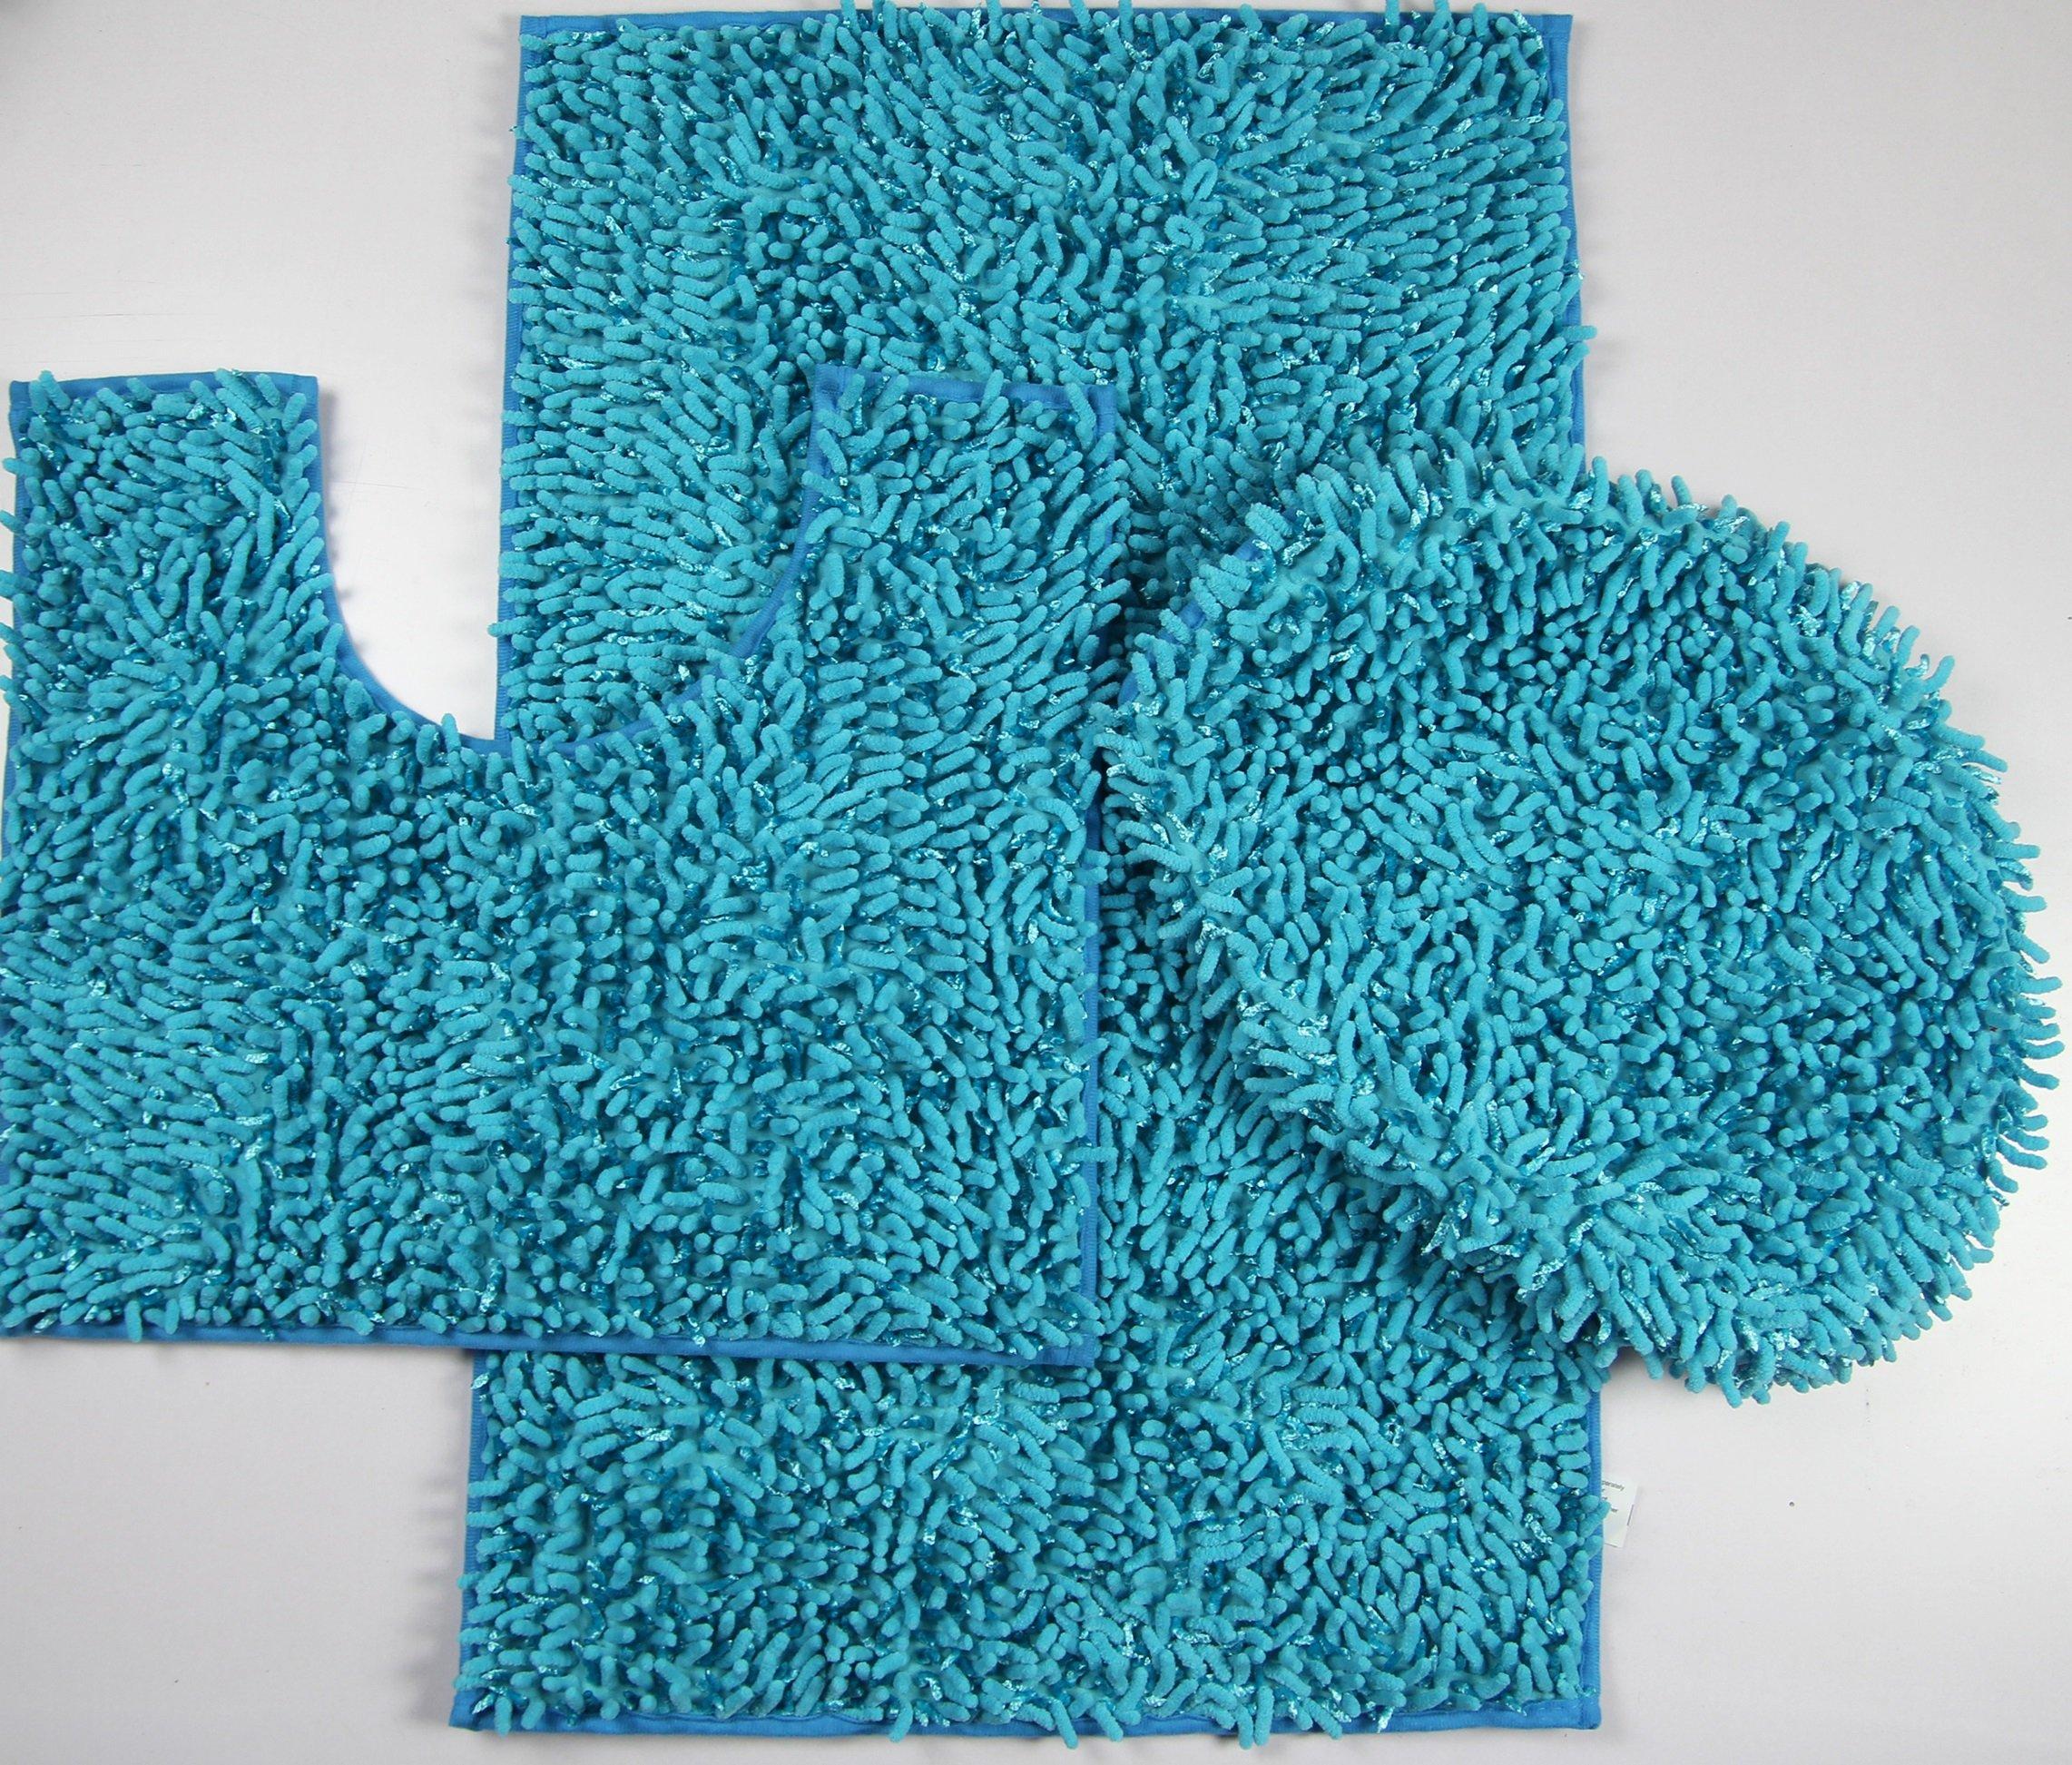 3 Piece Ultra Soft Microfiber Mixed Shiny Chenille Bath Mats Set Large Mat 19.5''x''31 Contour Mat 19.5''x''17.5 Lid 20''x''188 (Turquoise)